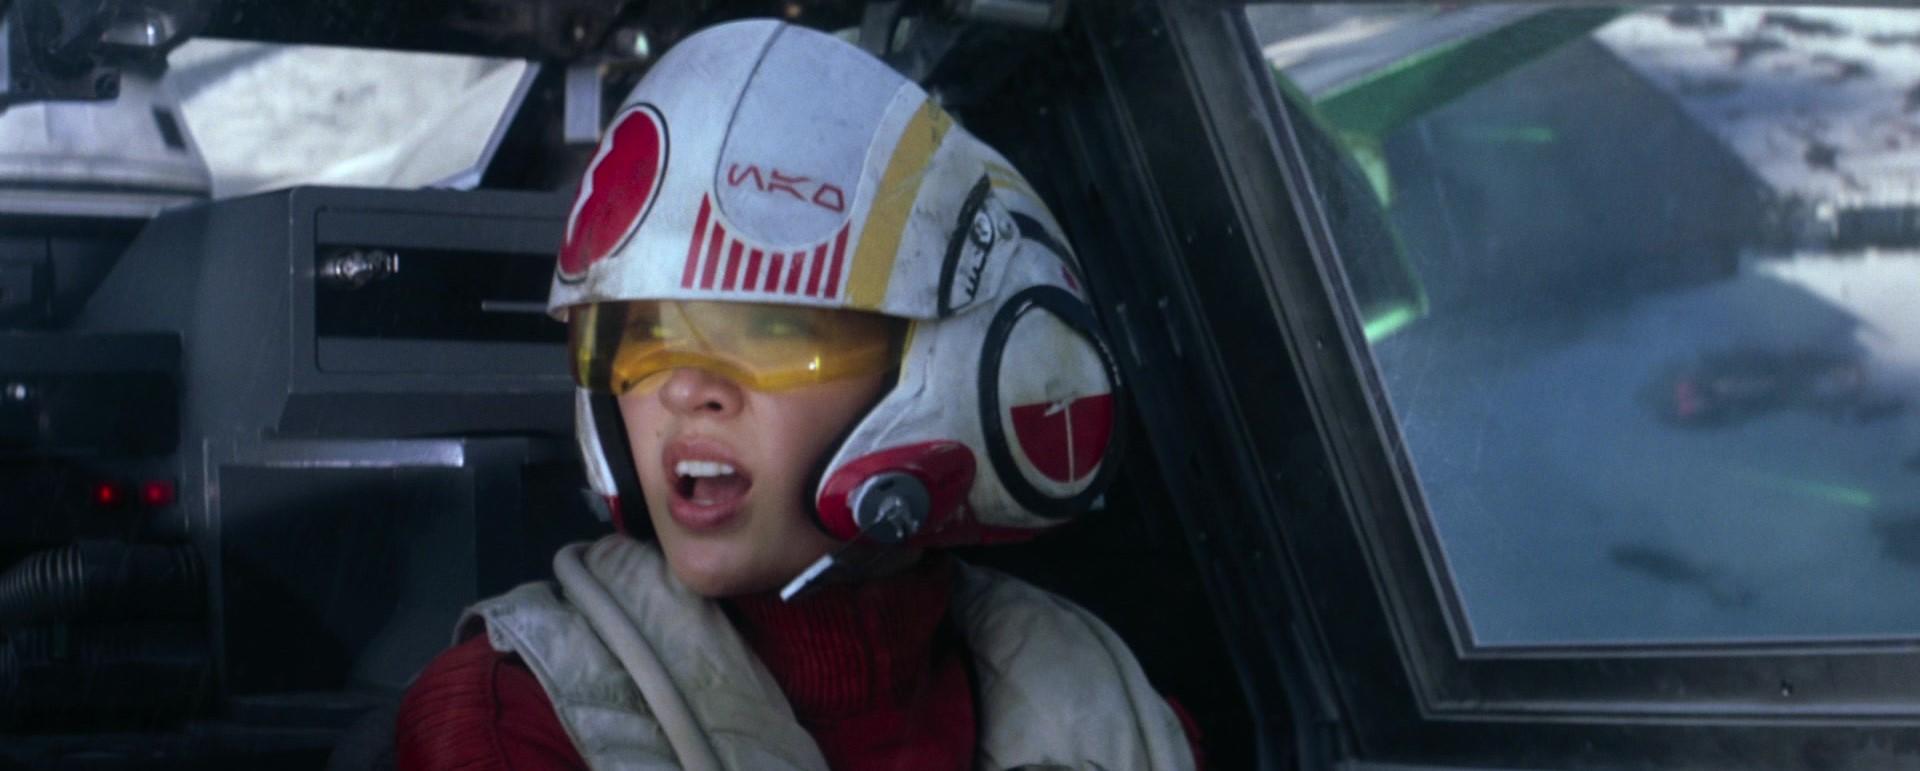 star wars the force awakens jessika pava battle of starkiller base